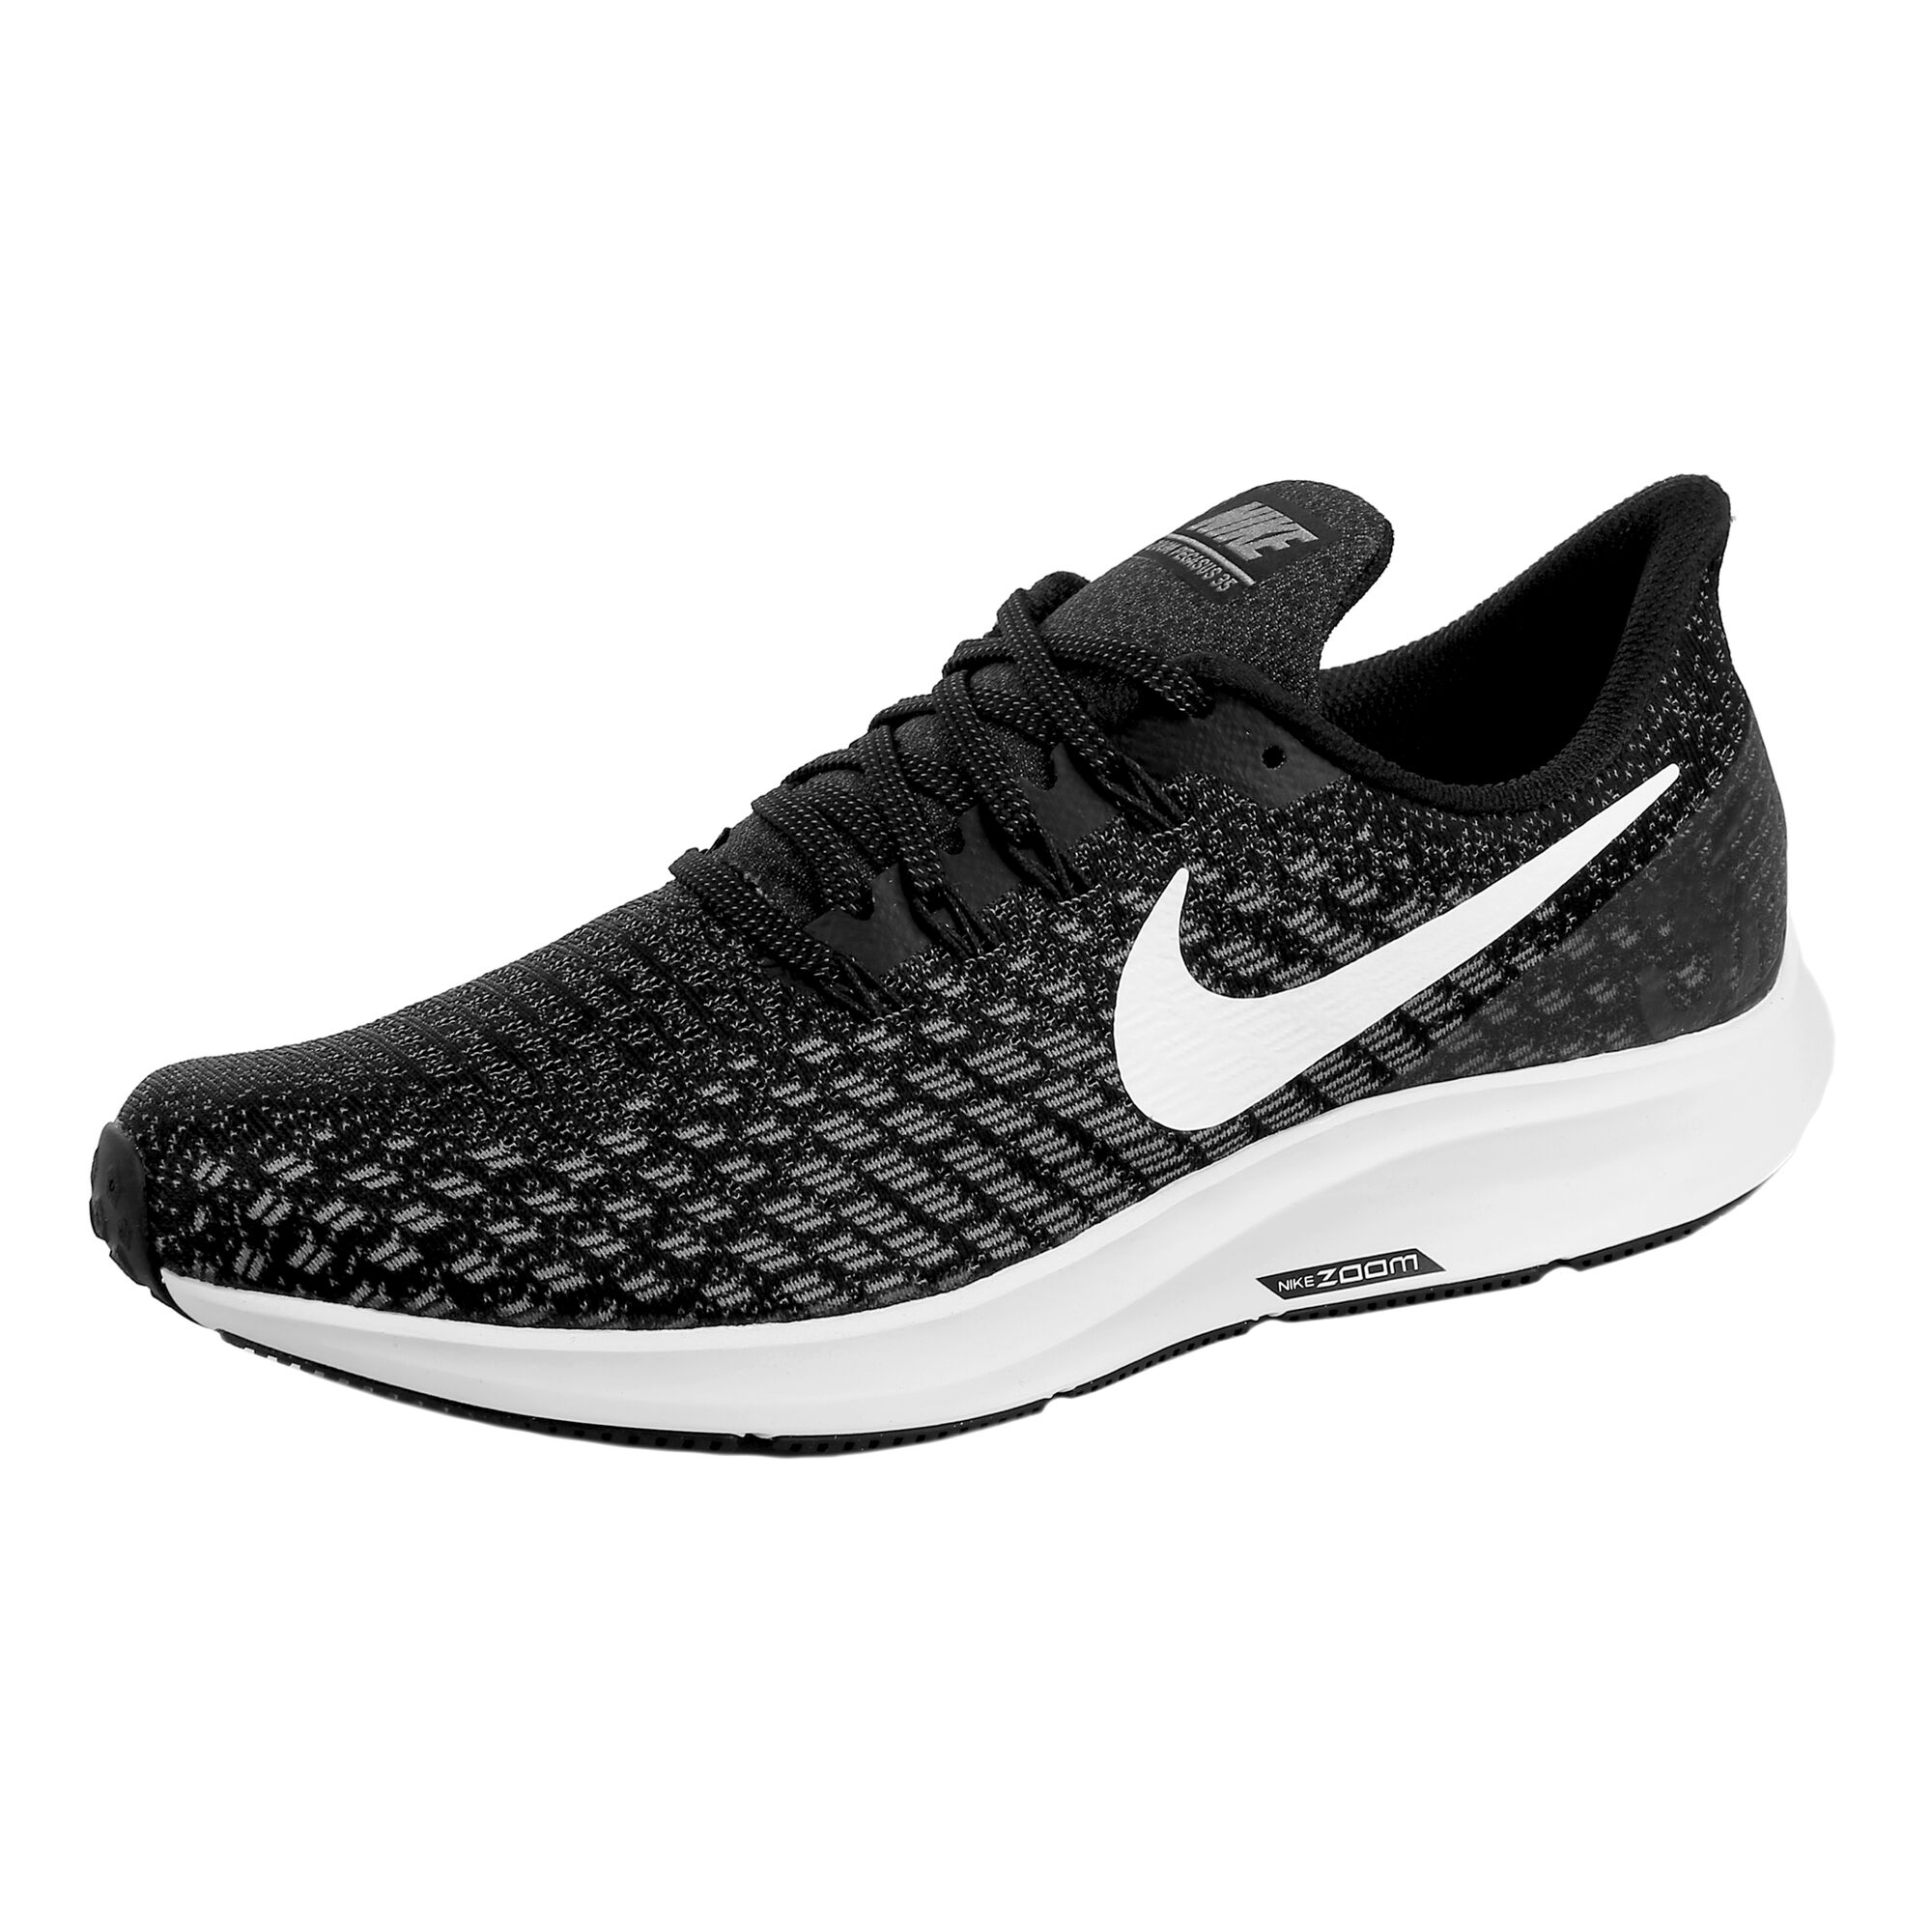 a33362ca7c283 buy Nike Air Zoom Pegasus 35 Neutral Running Shoe Women - Black ...